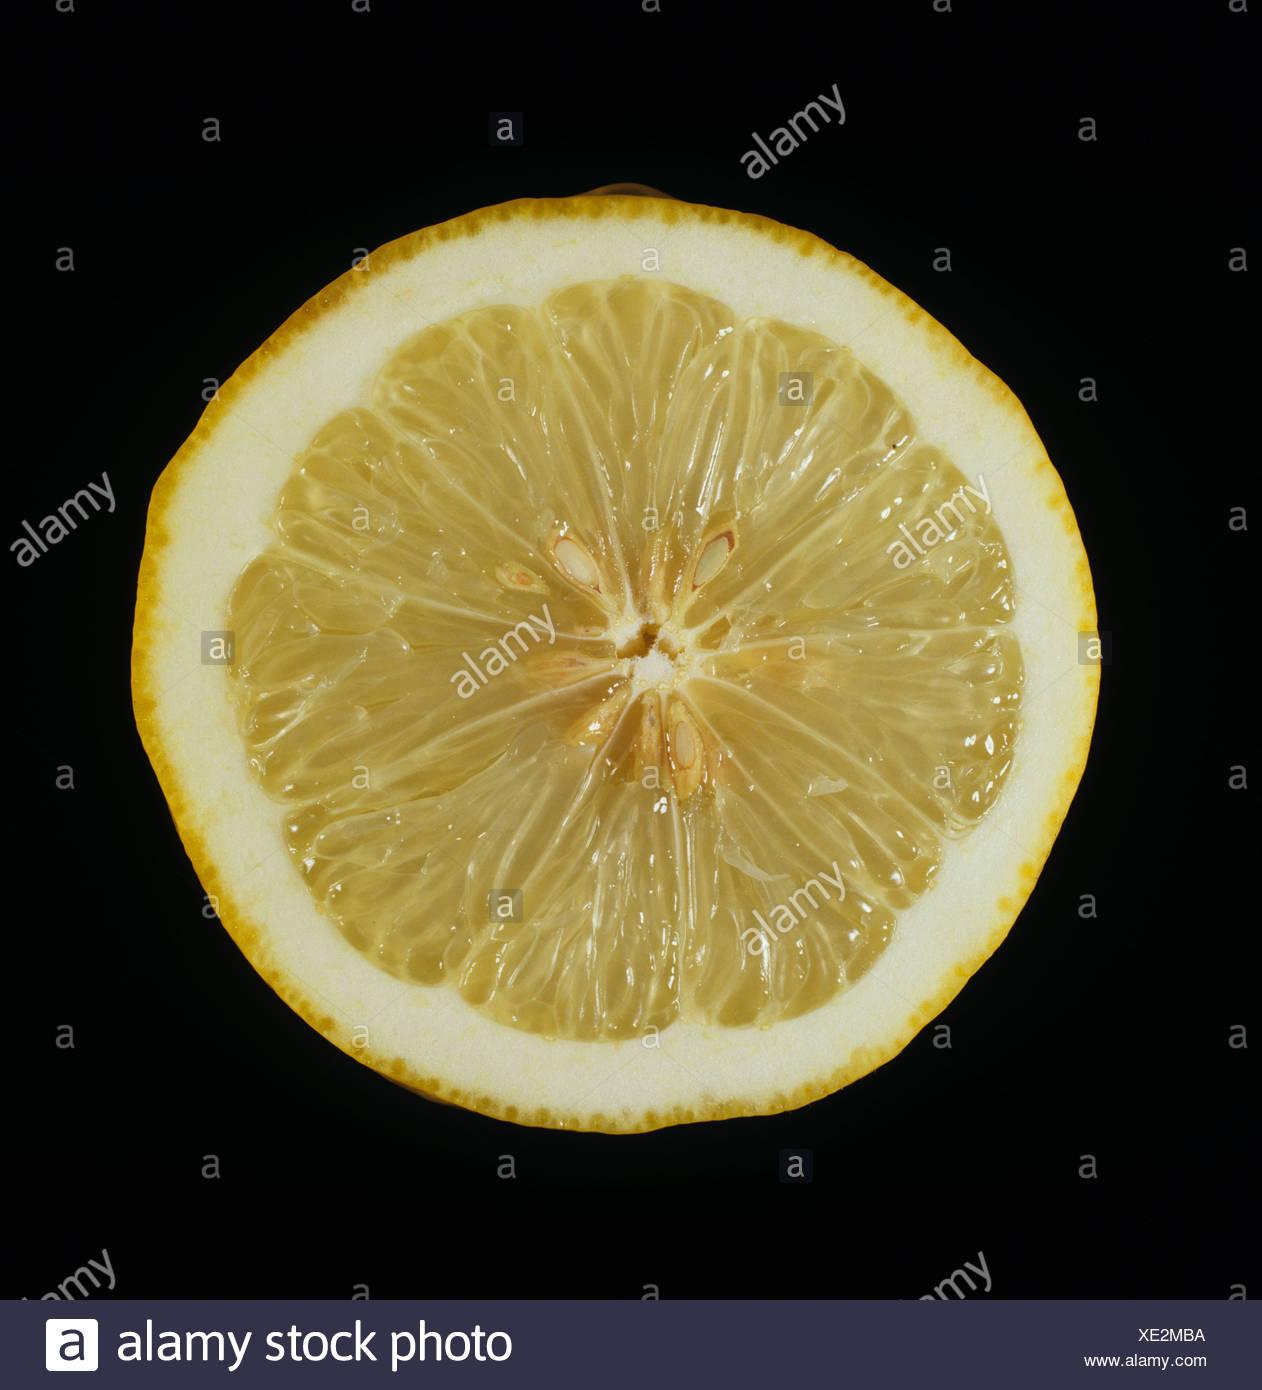 Cut section of a citrus fruit lemon variety Ponderosa - Stock Image